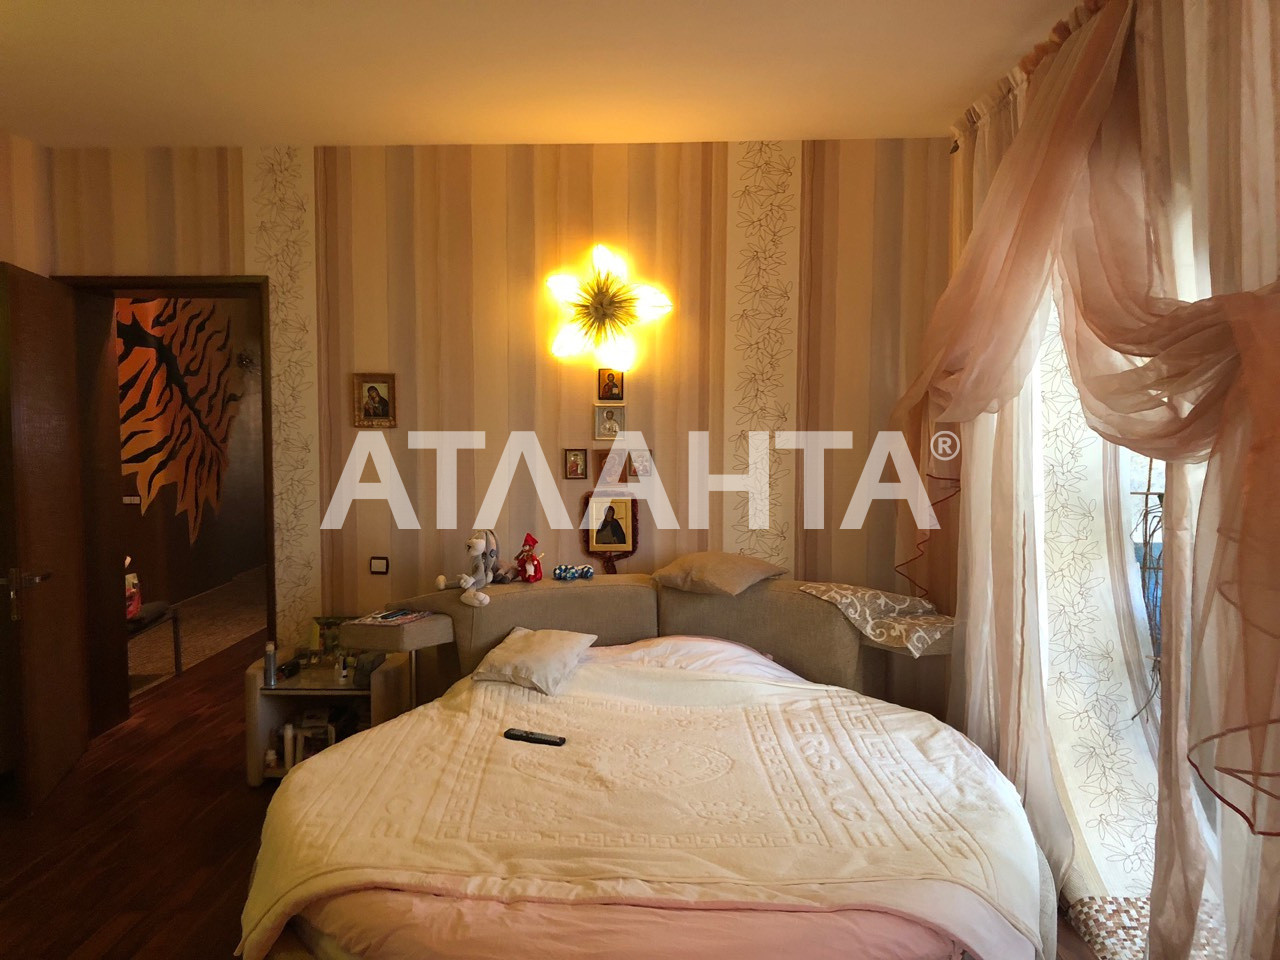 Продается 3-комнатная Квартира на ул. 1 Мая — 135 000 у.е. (фото №16)